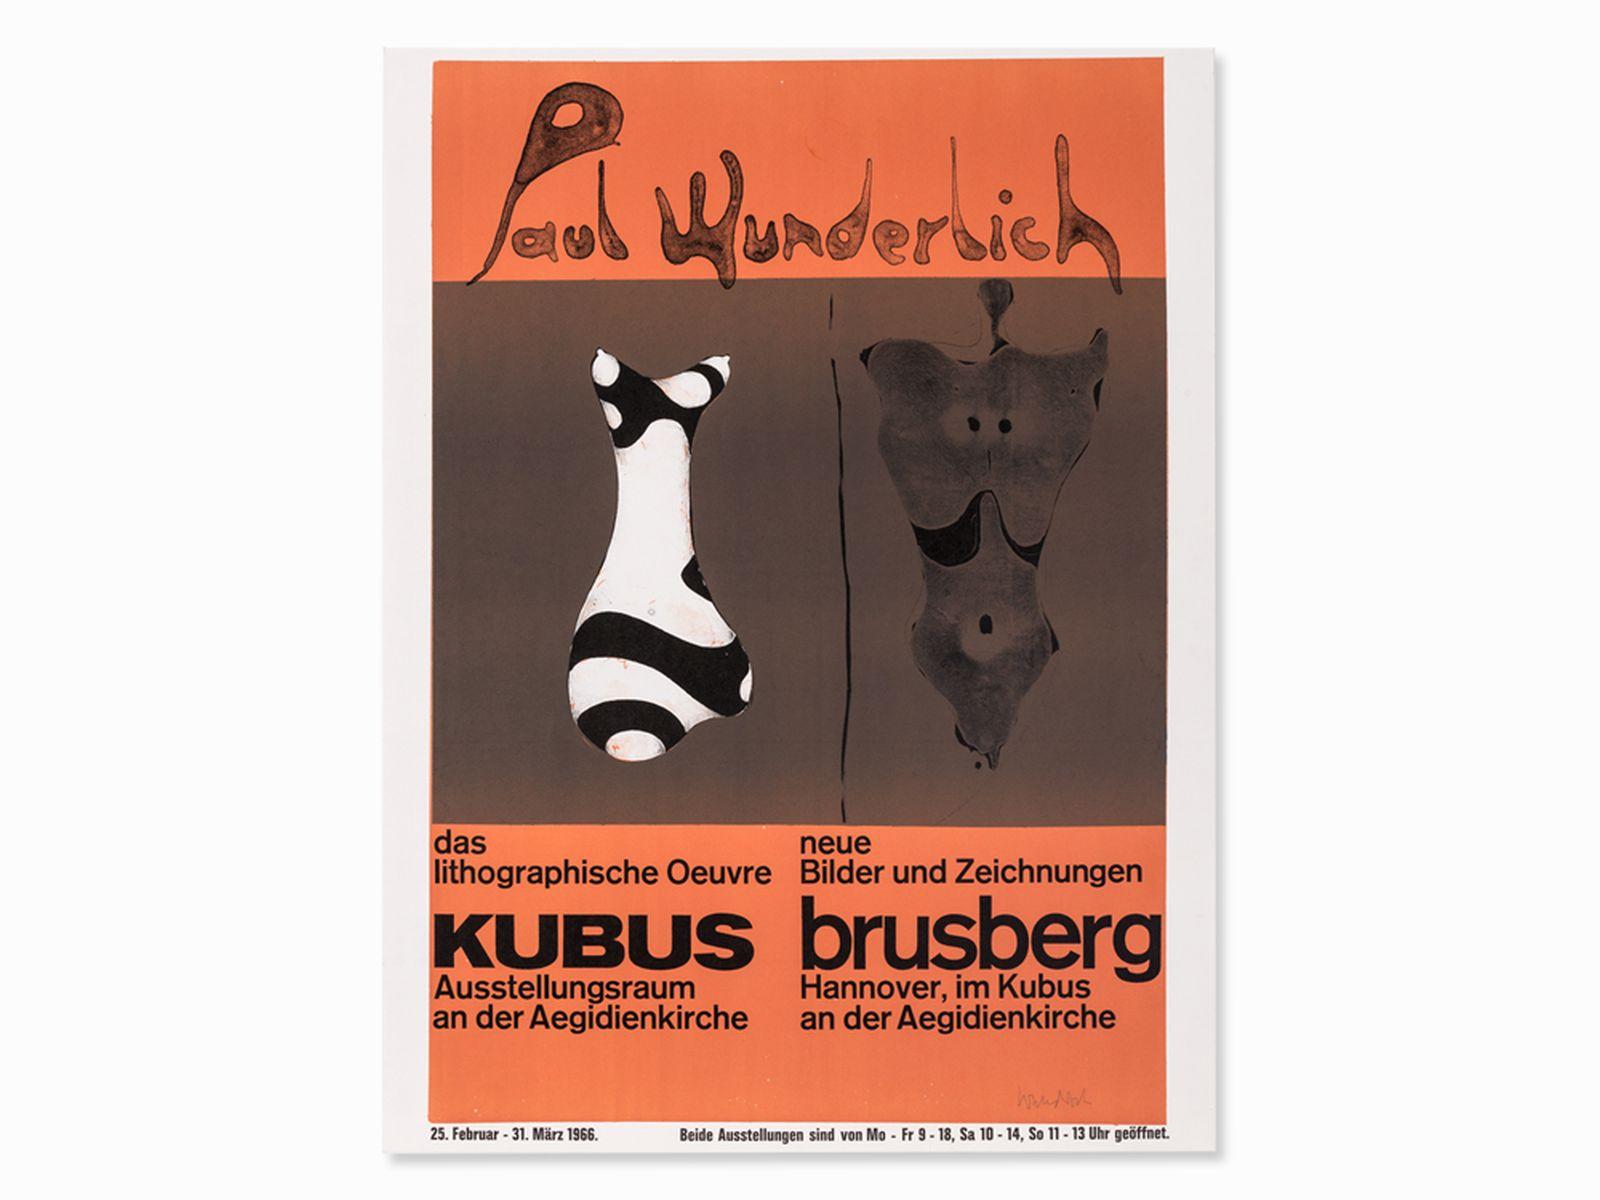 #93 Paul Wunderlich Image